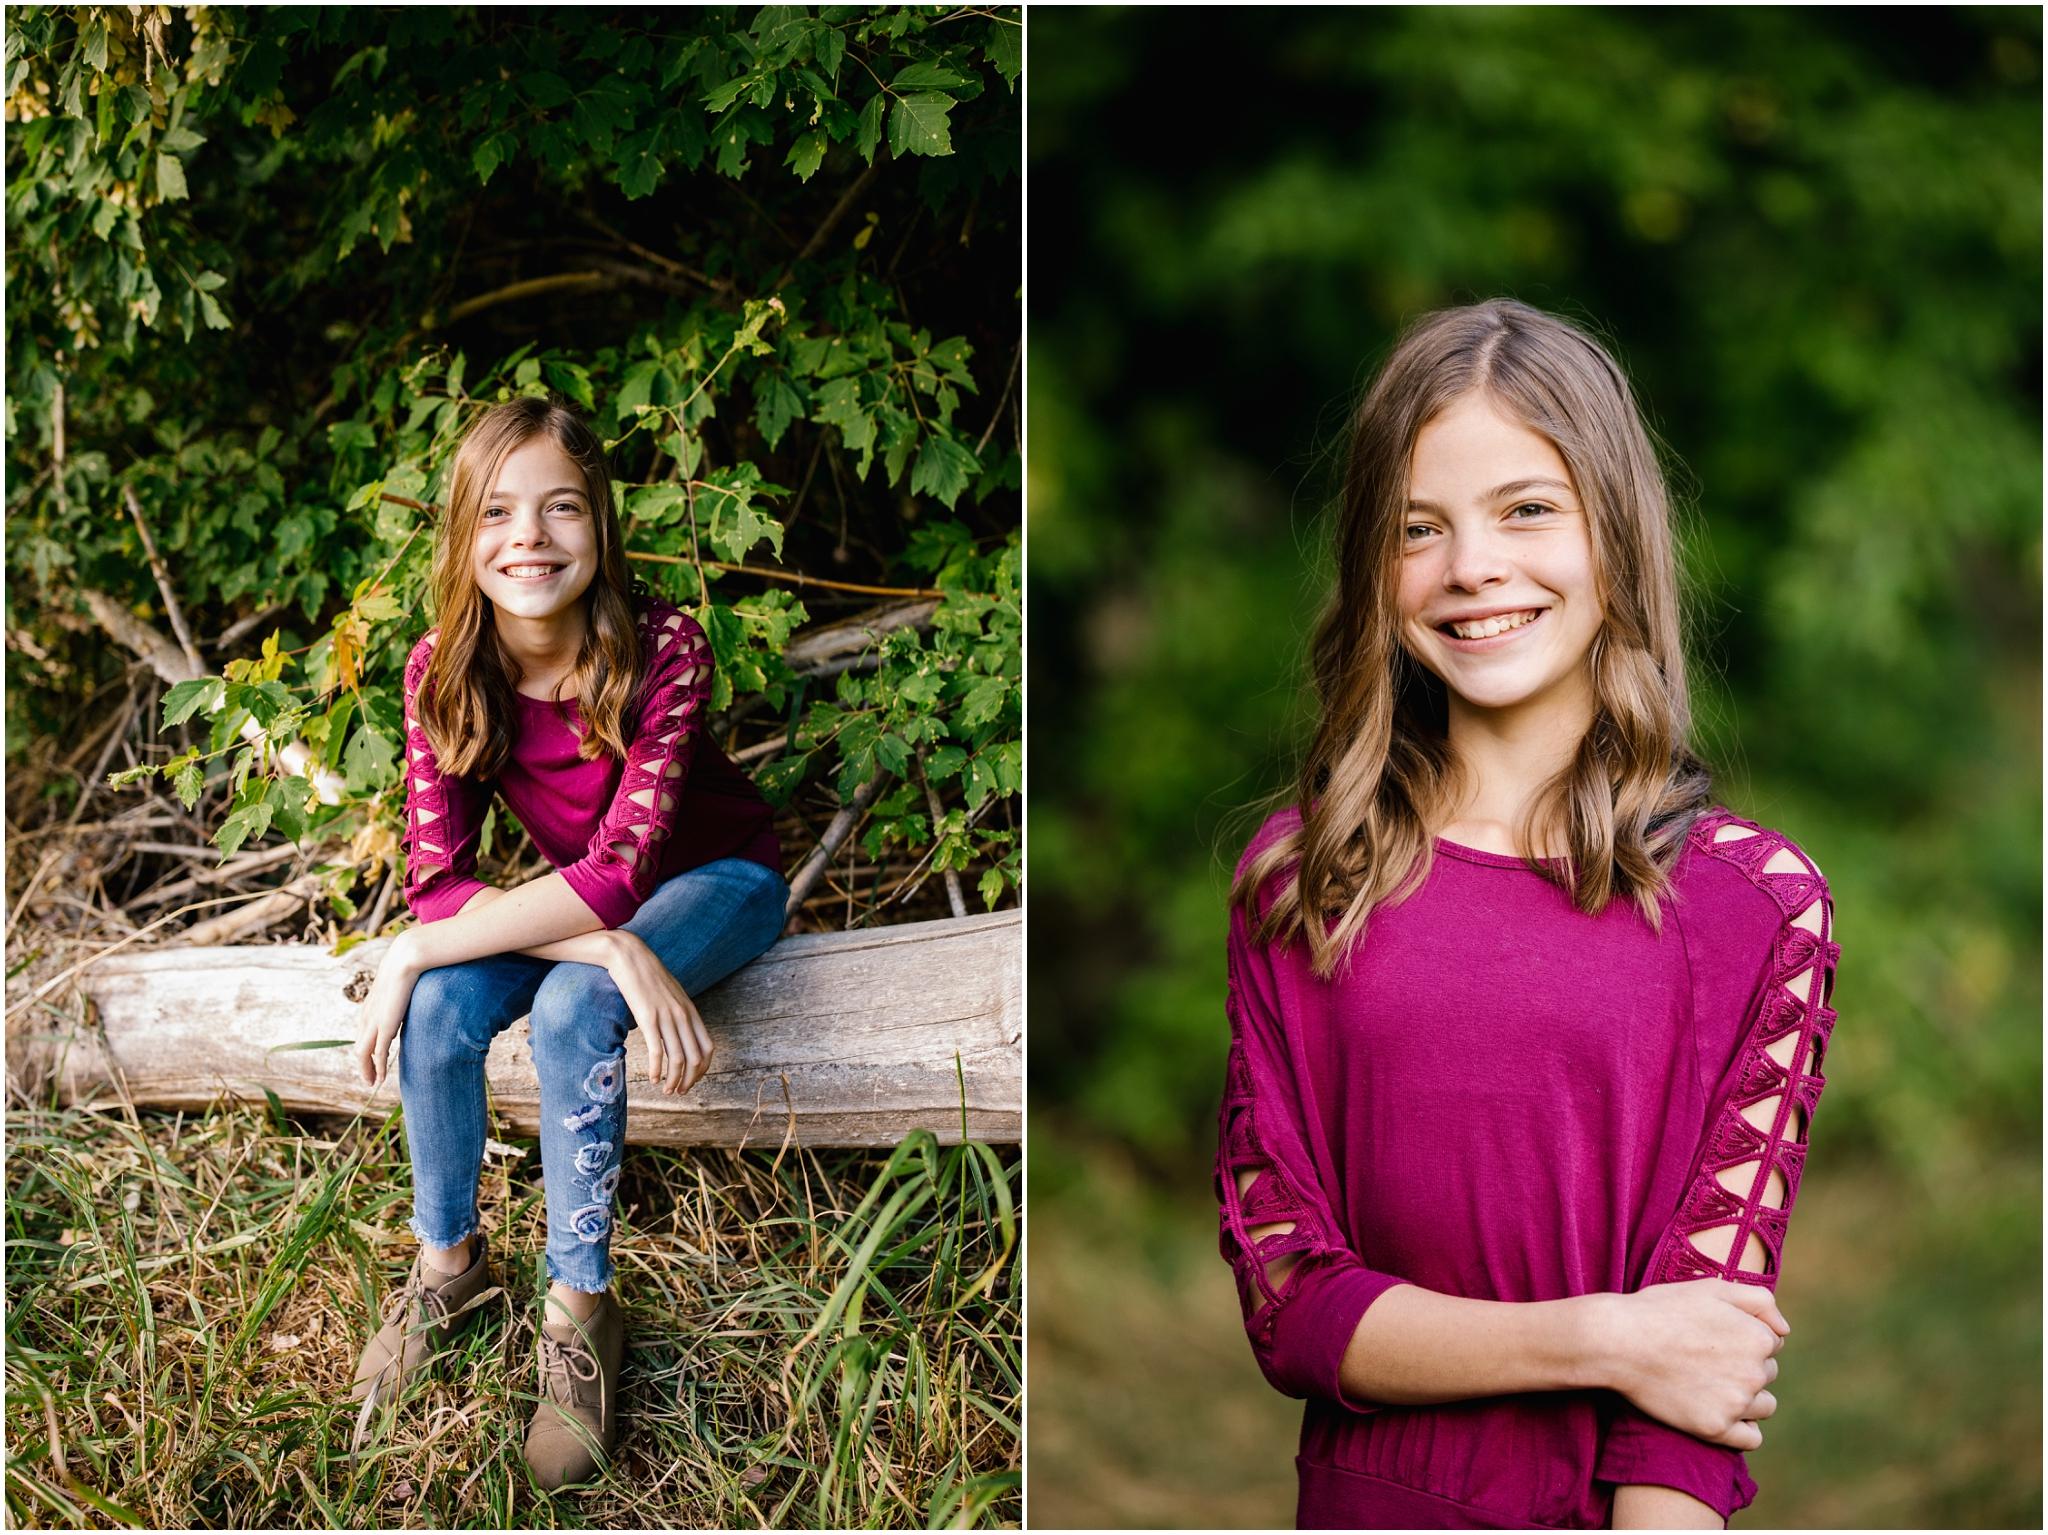 Hurst-24_Lizzie-B-Imagery-Utah-Family-Photographer-Hobble-Creek-Canyon-Jolleys-Ranch-Utah-County.jpg